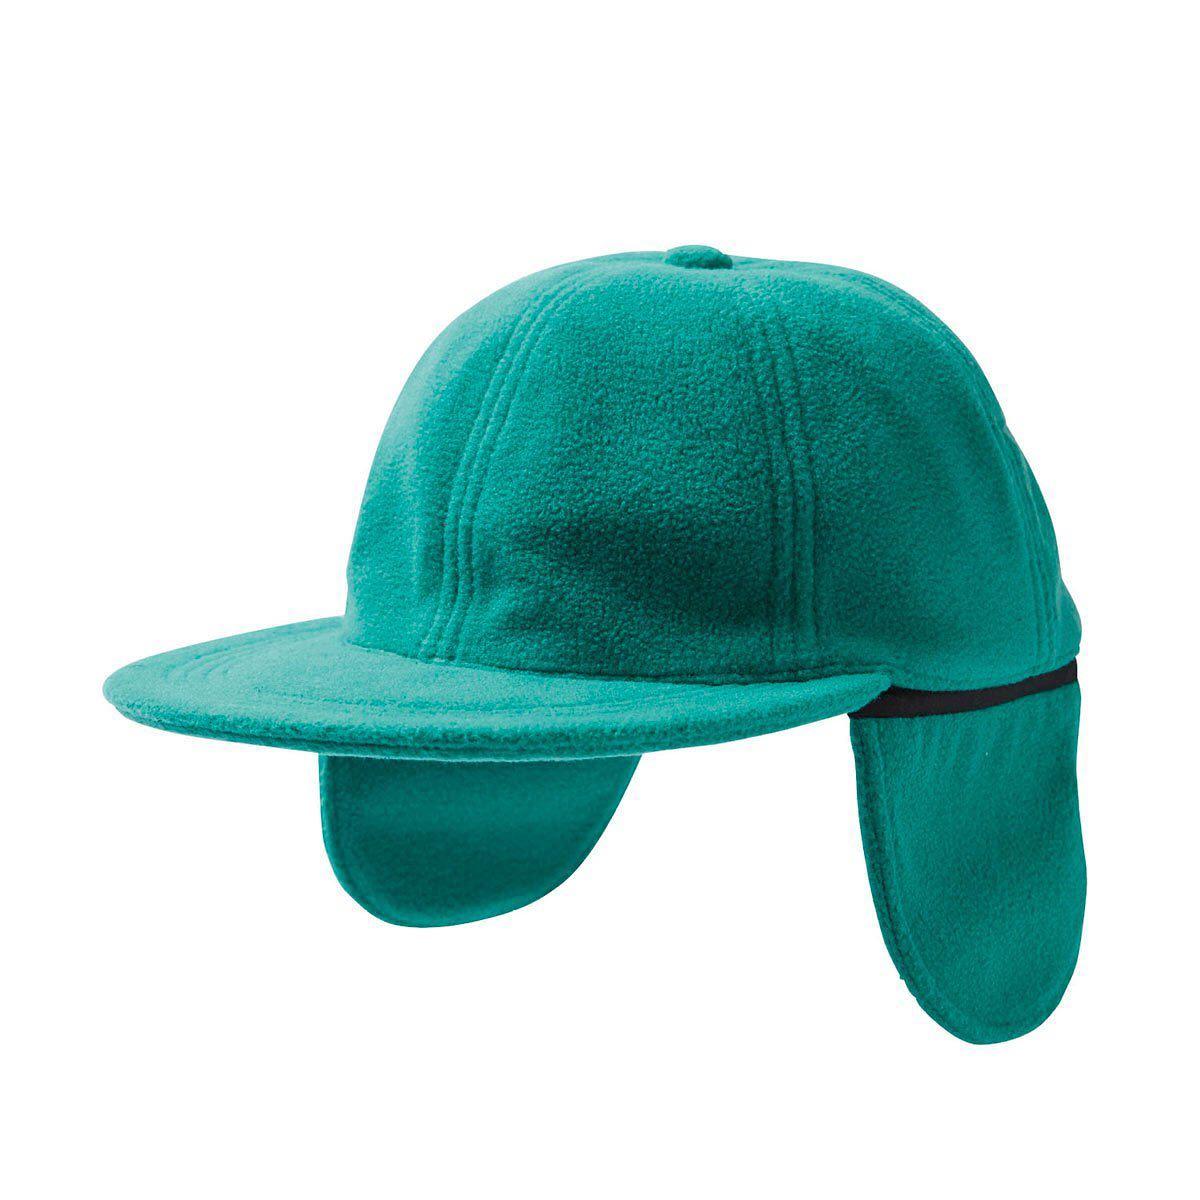 ・@evisenskateco / FLEECE FLAP CAPSTITCH FLEECEのセットアップと同素材を使用したフラップ収納CAP。収納式フラップにより防寒性を備えた上、シーンに応じた2WAYスタイリングも。シンプルながらも拘りを加えたEVIピヨ縫製が特徴的。